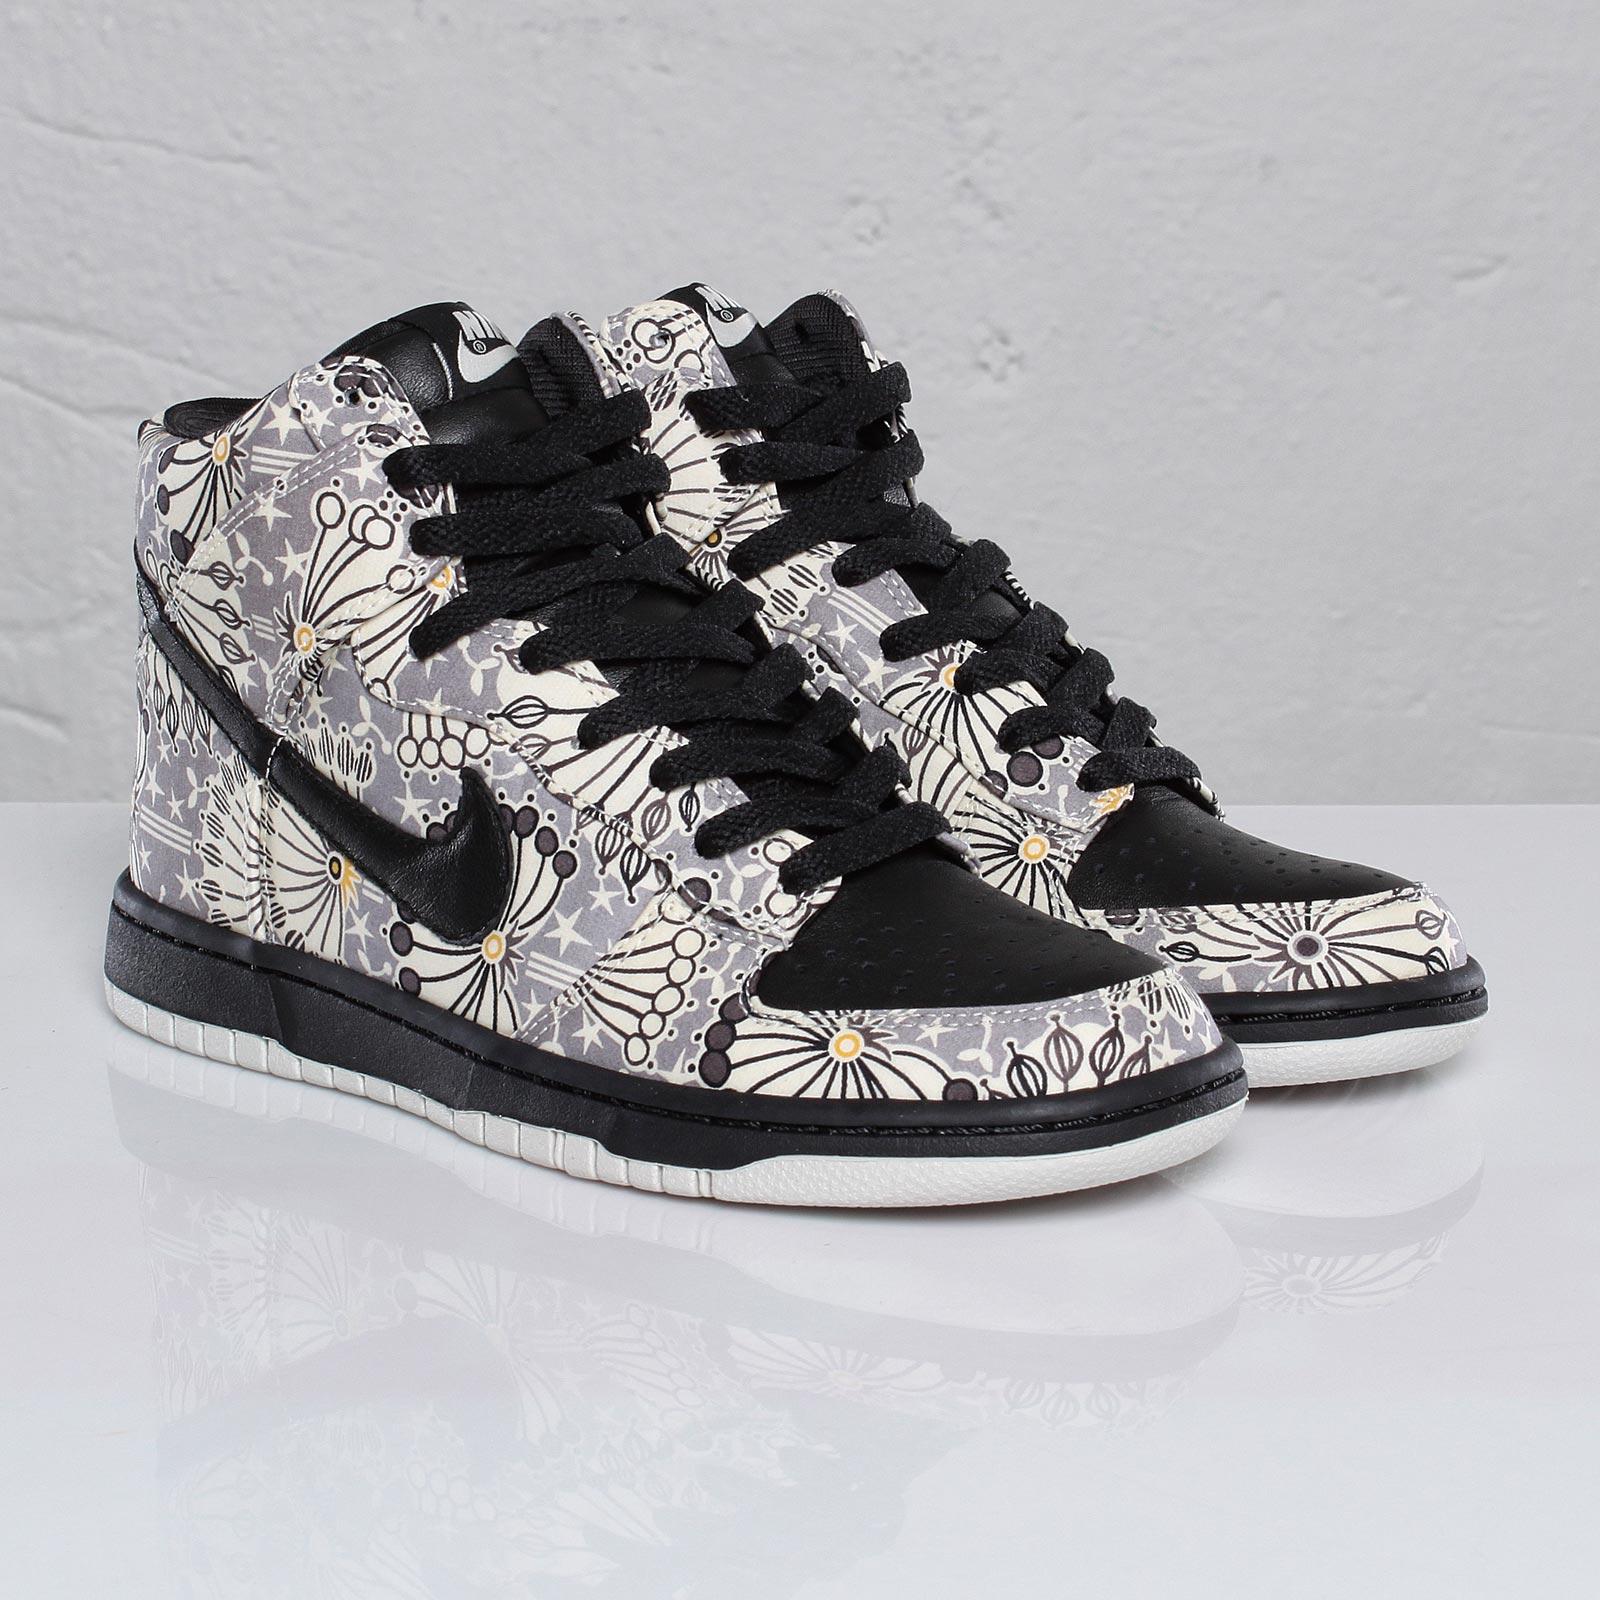 Nike Wmns Dunk Hi Skinny Prm - 101304 - Sneakersnstuff  9a33396fcf5f